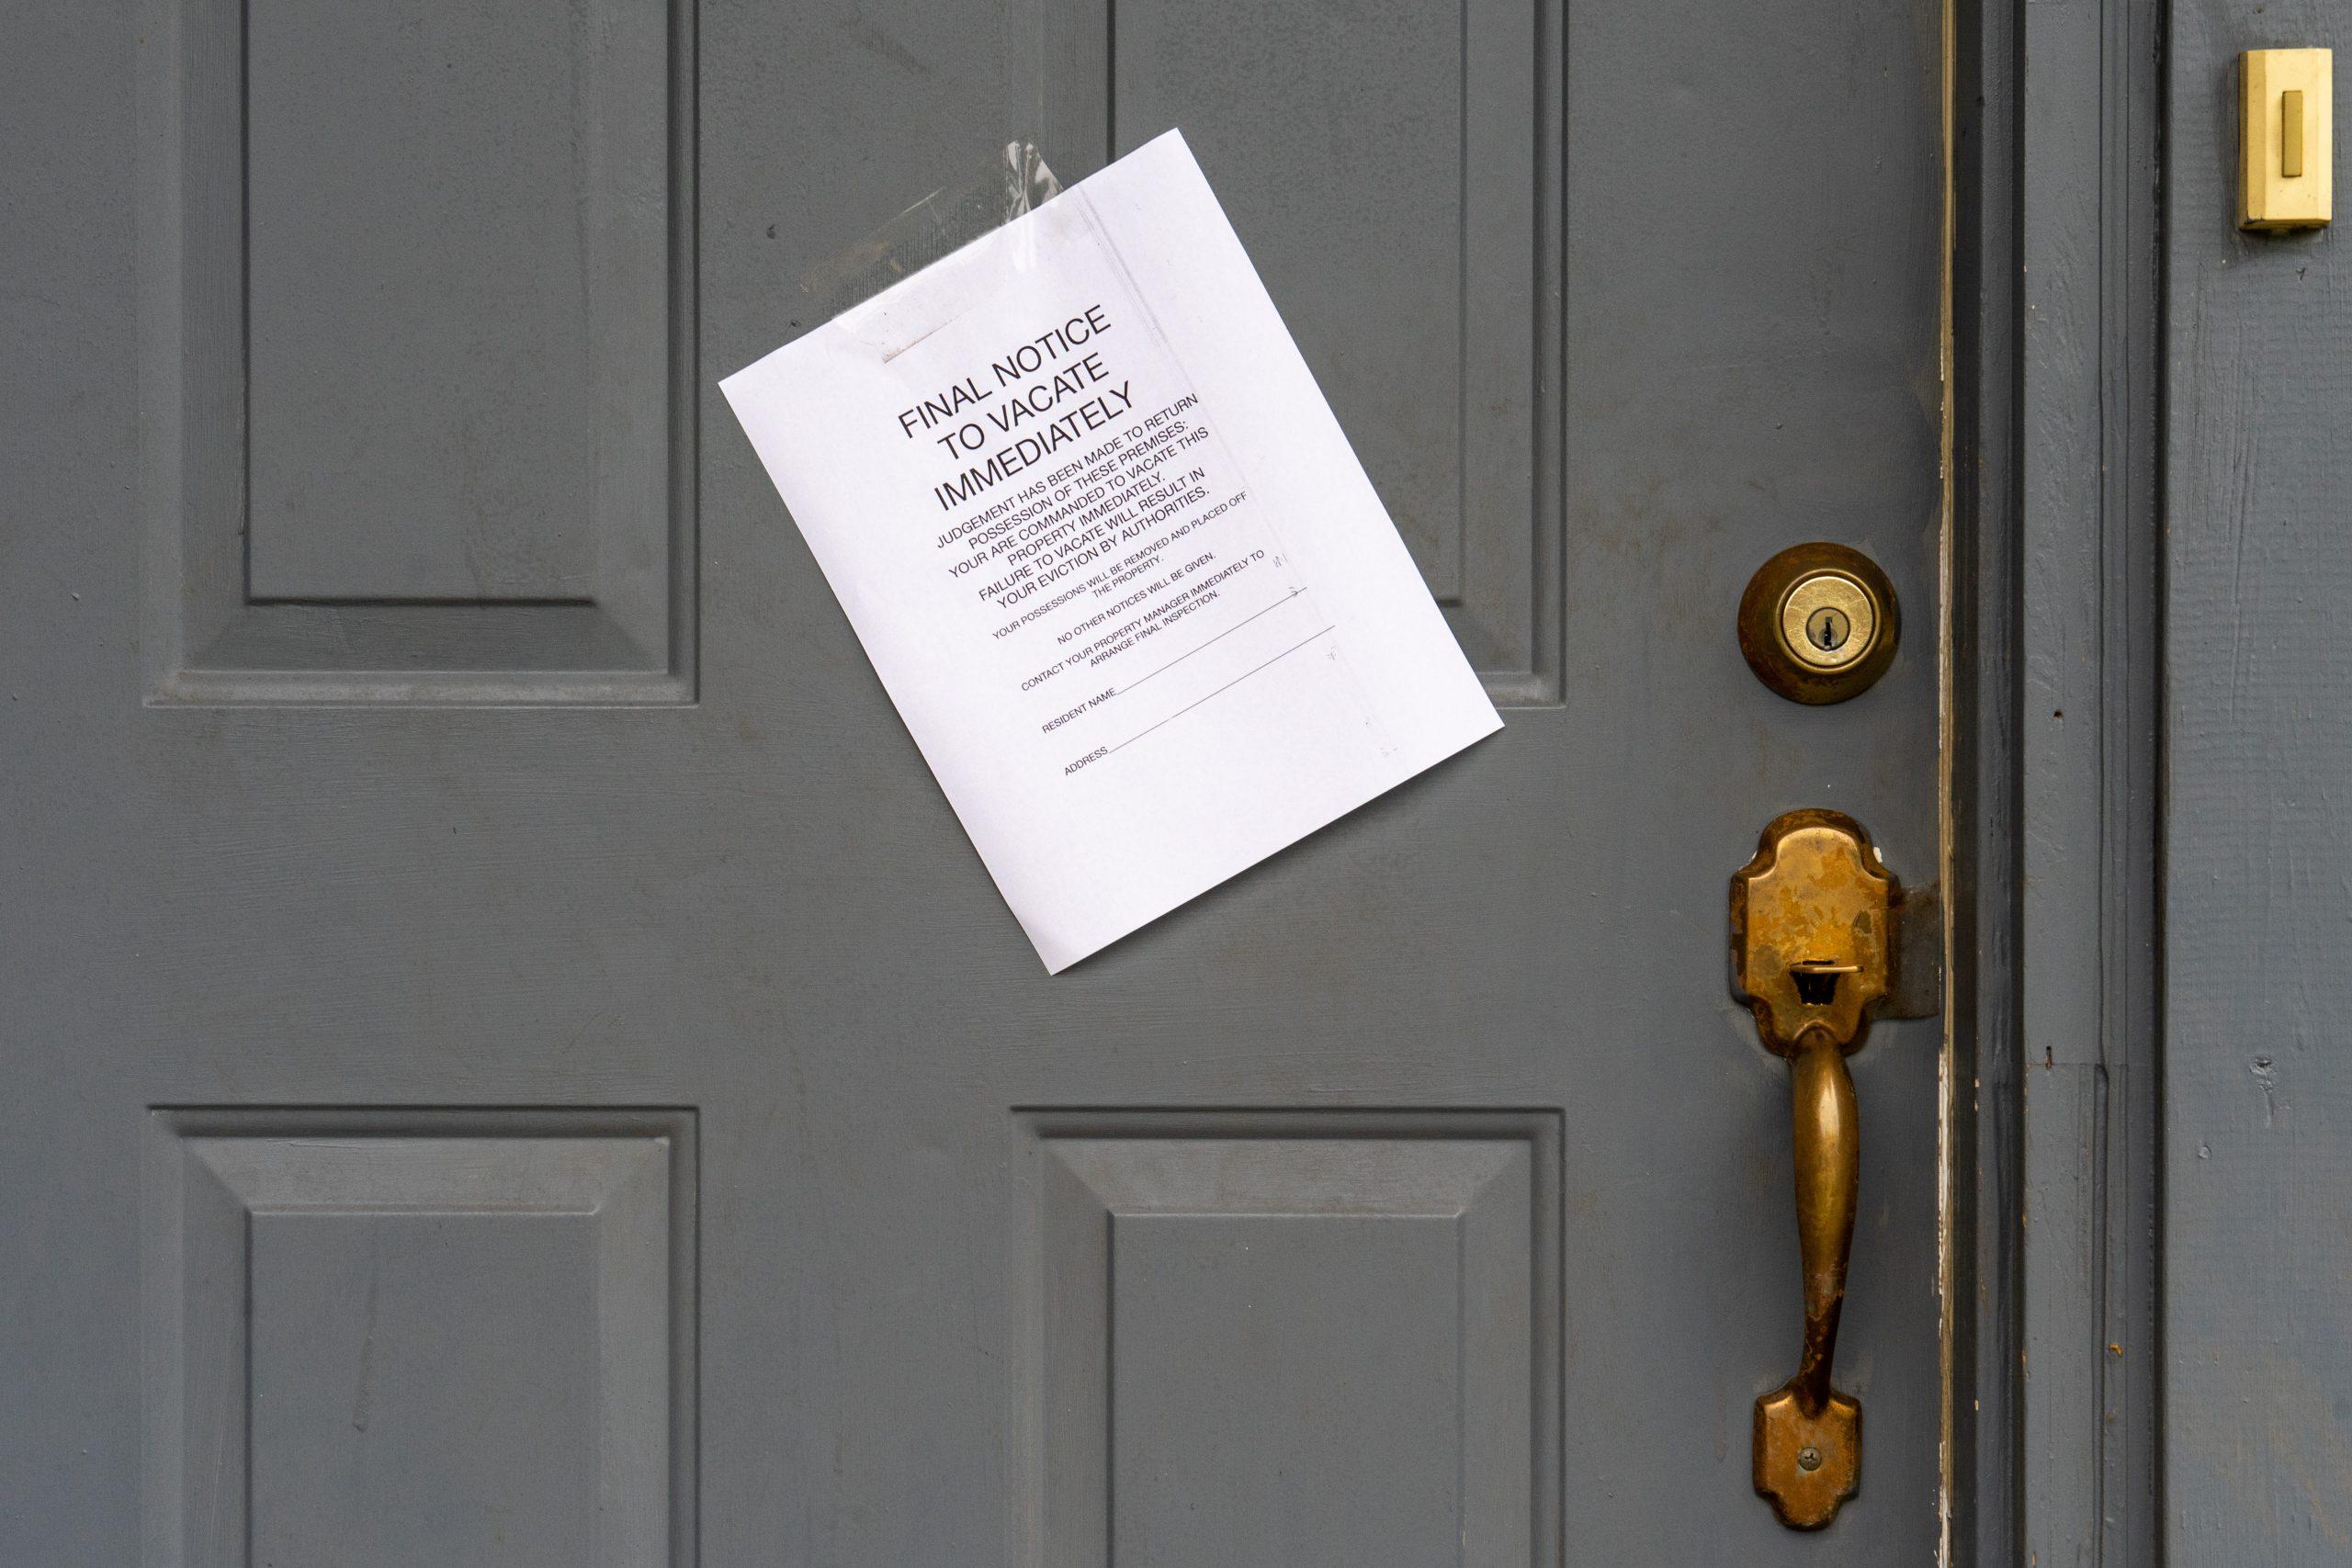 Oregon Bill: Oregon House Passes Bill on Evictions